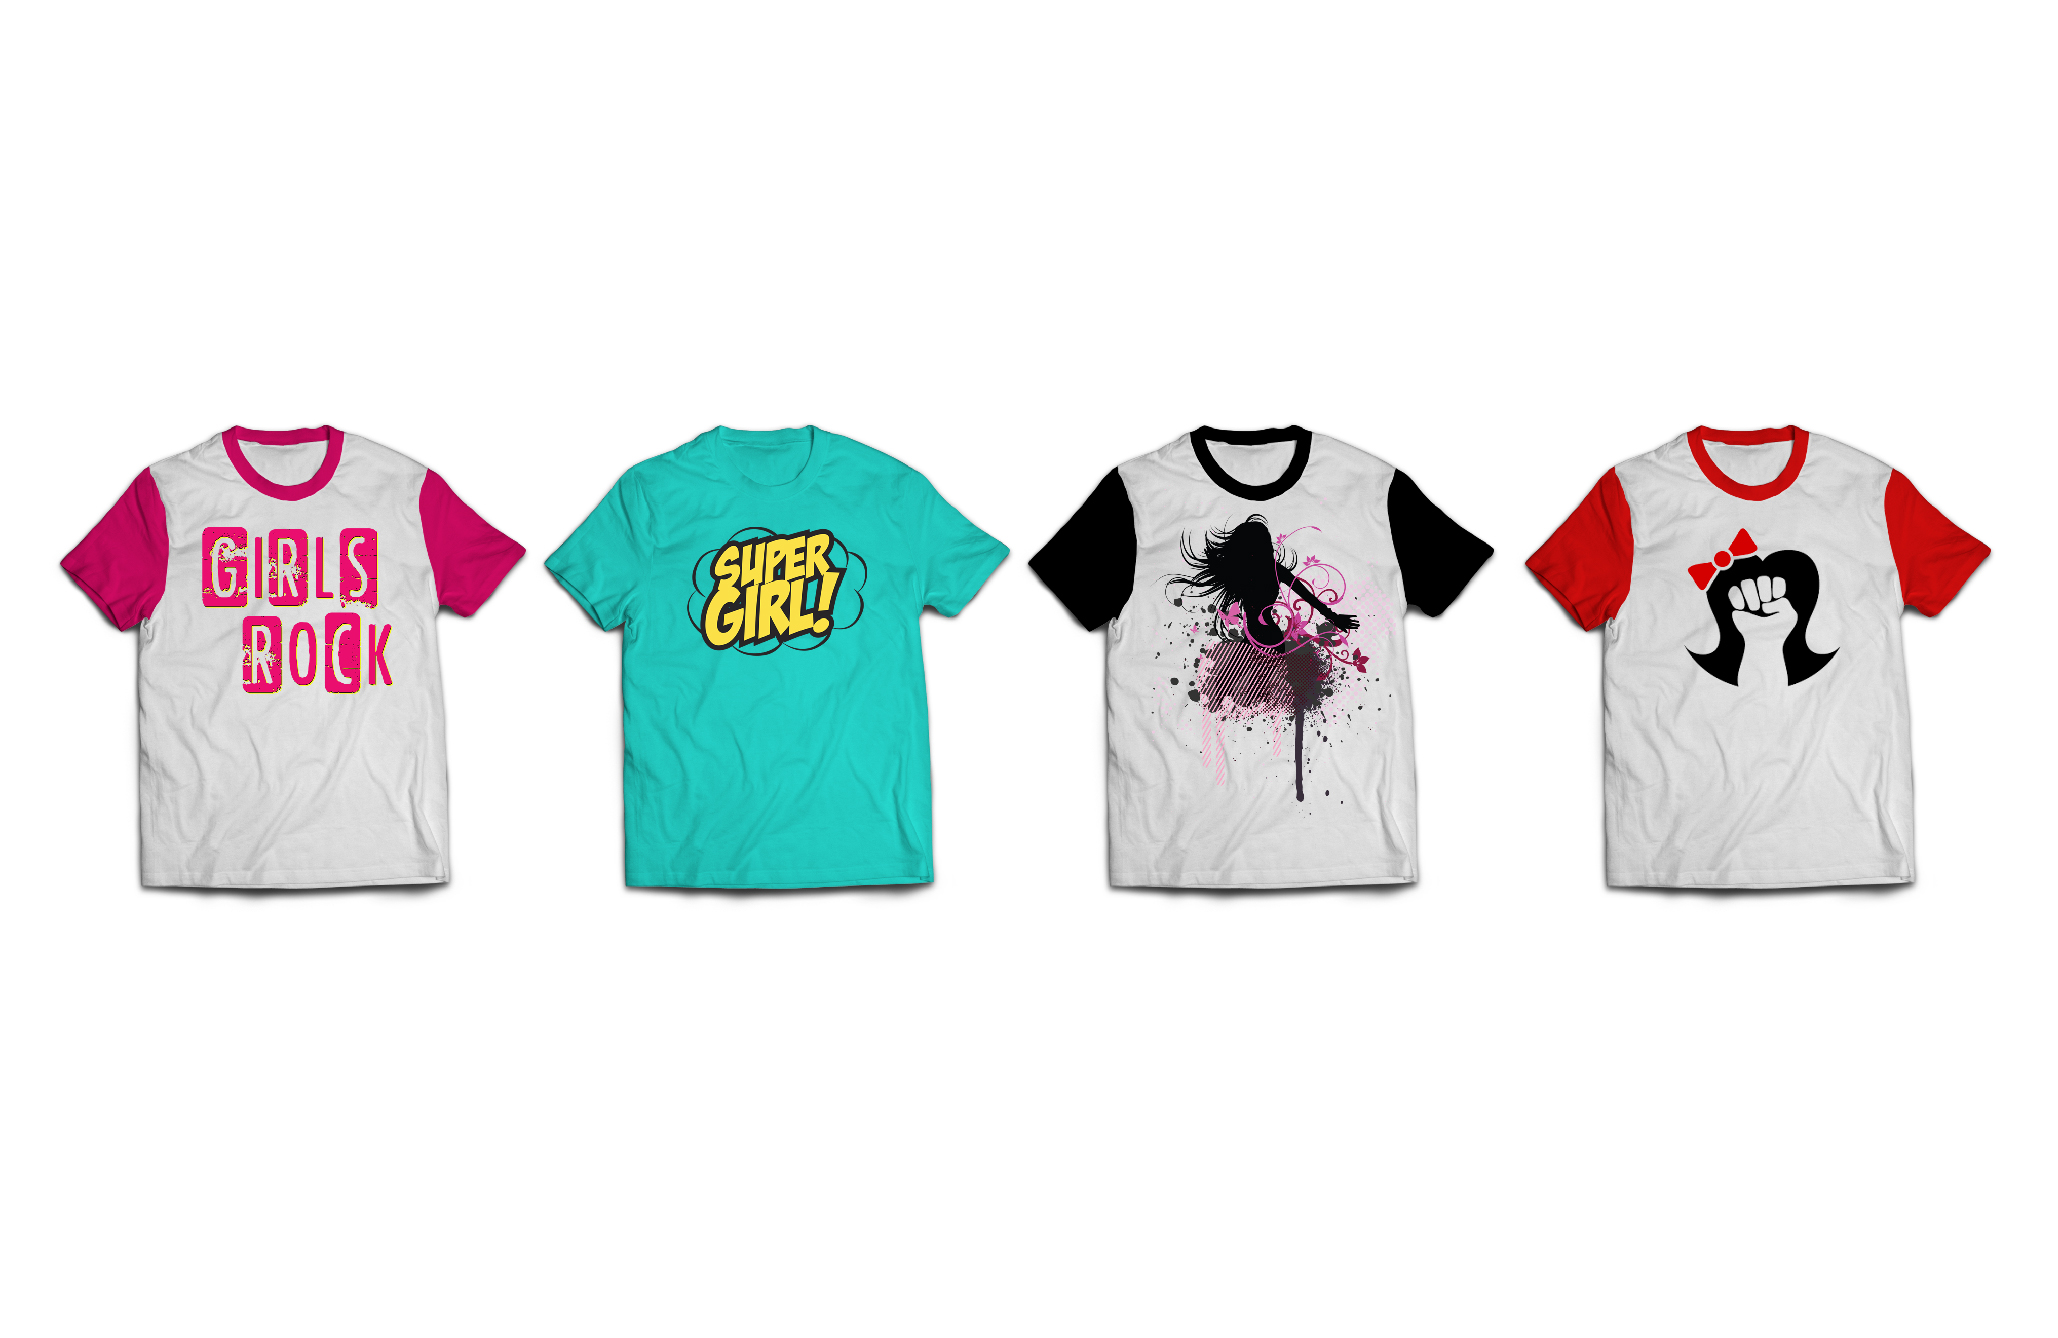 Girl Power T-Shirt Design - King of Harts - Melissa Joan Hart